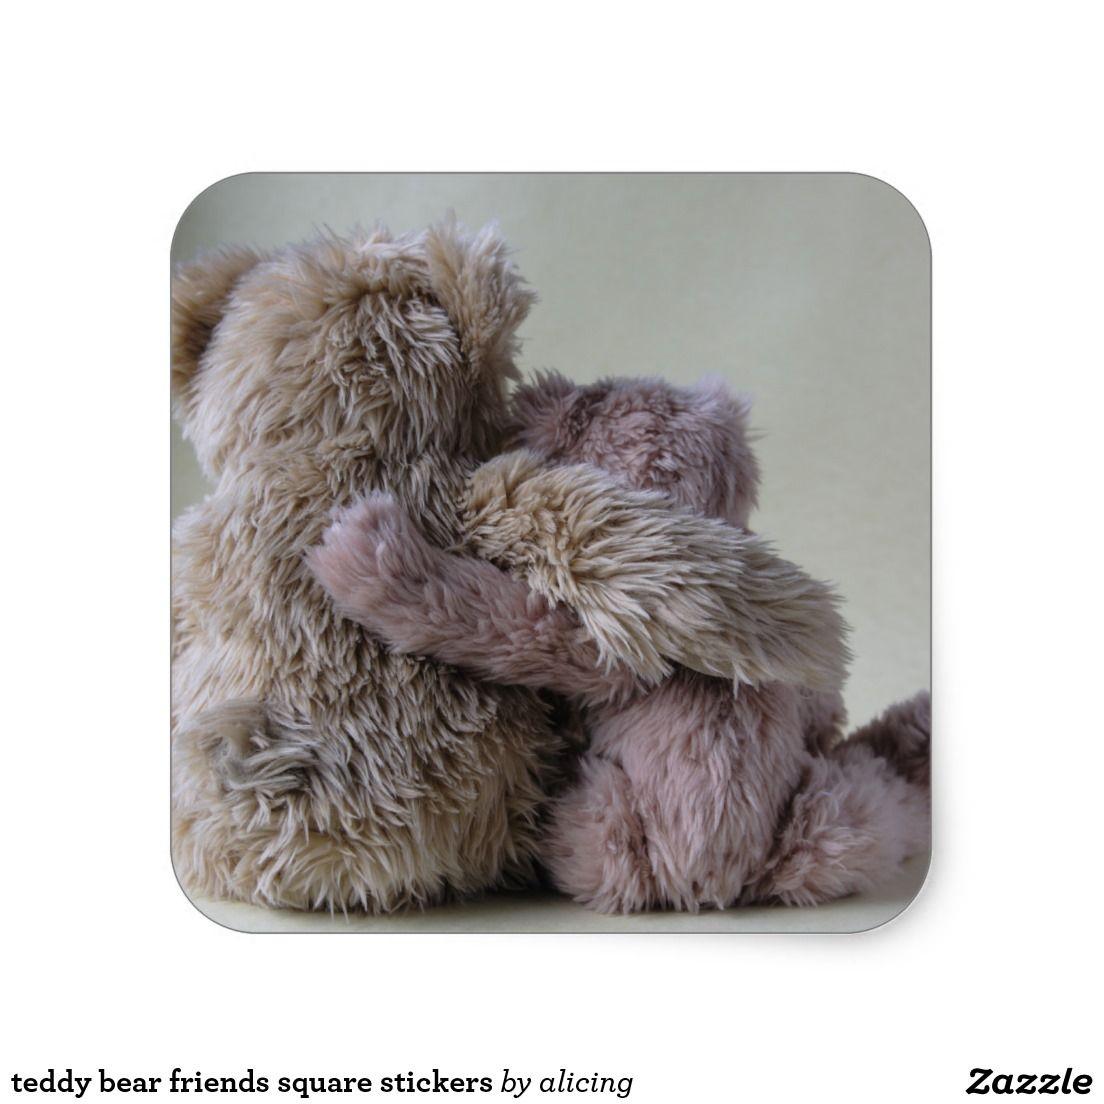 teddy bear friends square stickers